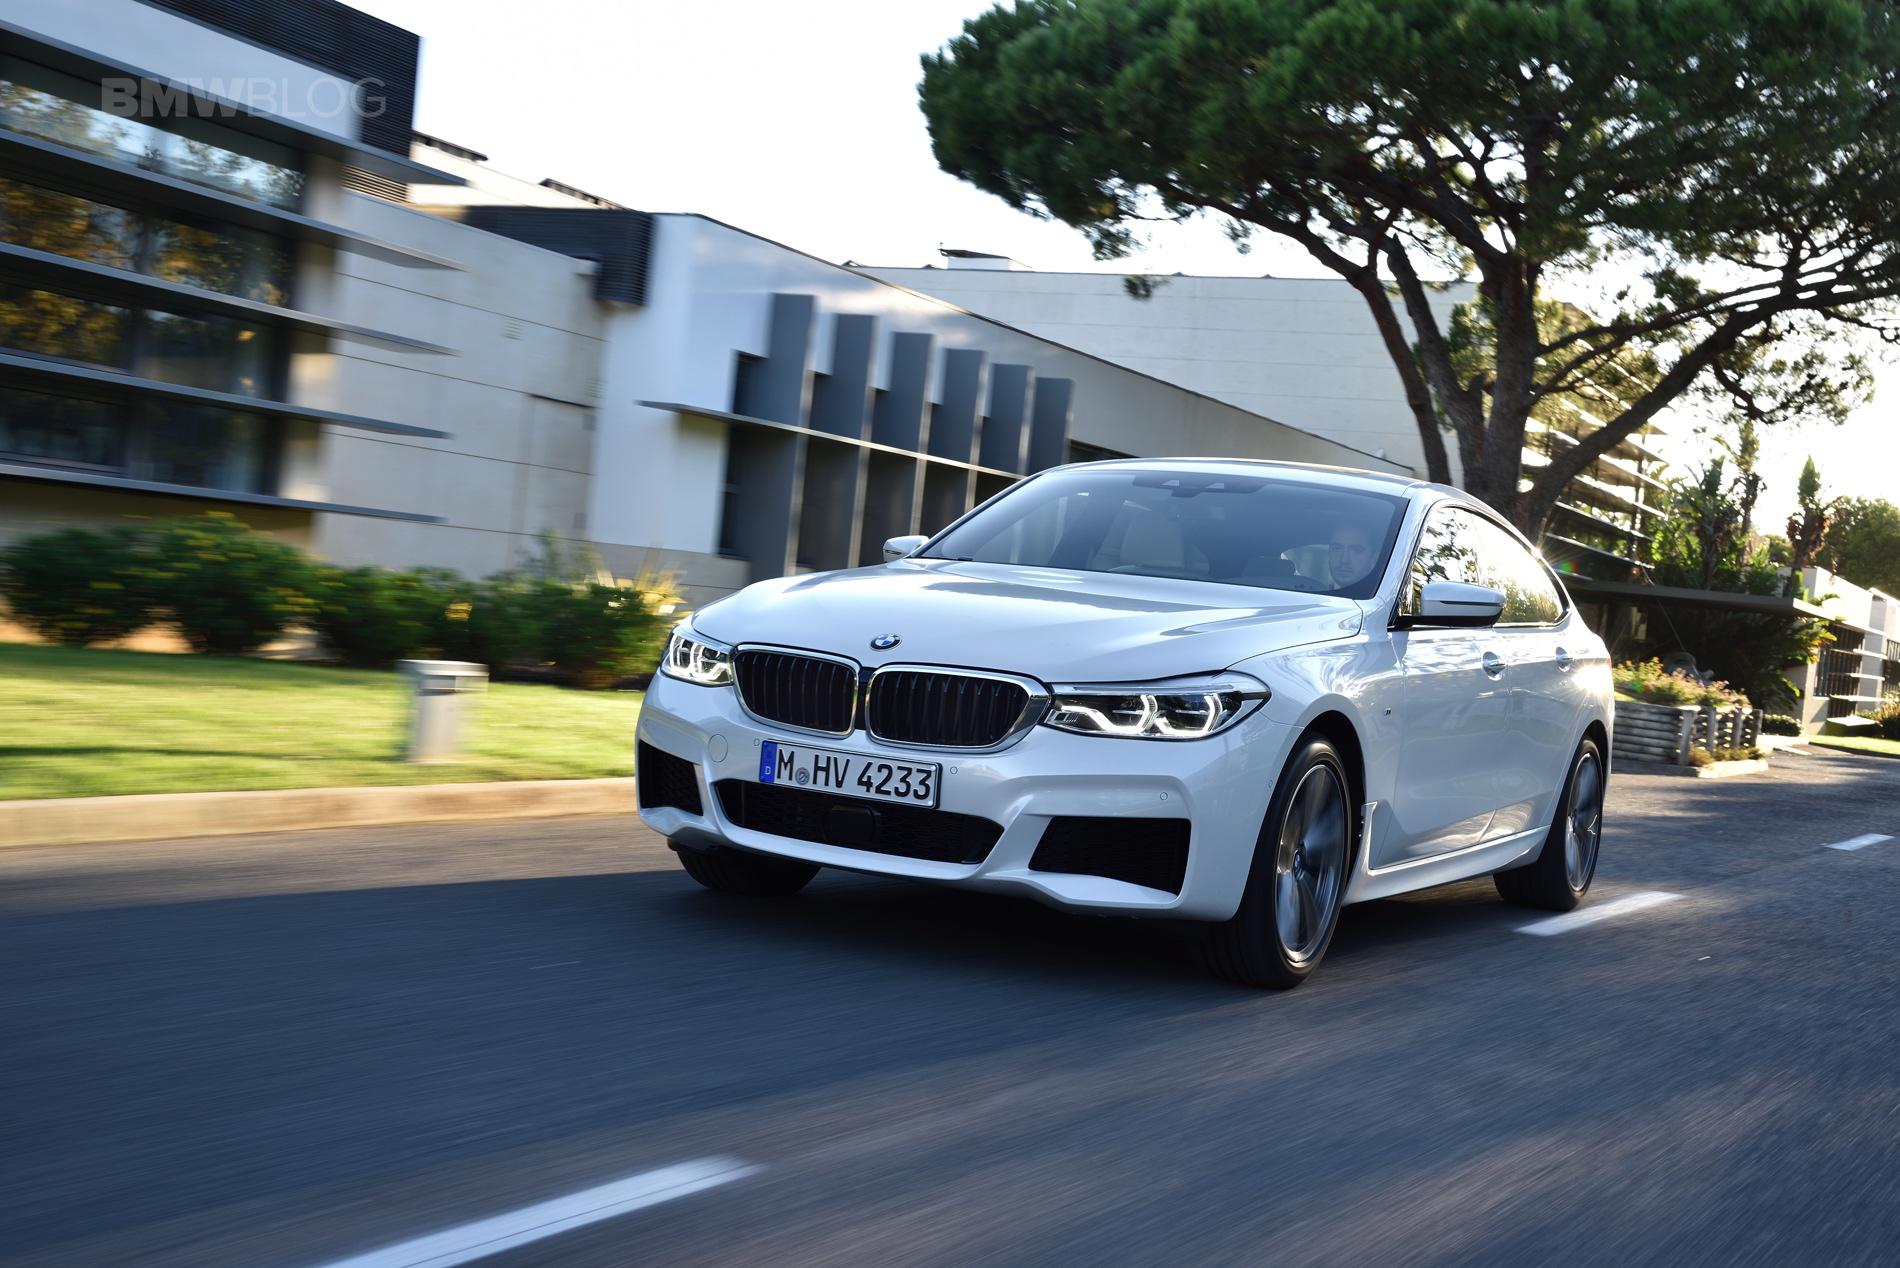 BMW 6 Series Gran Turismo GT test drive 25